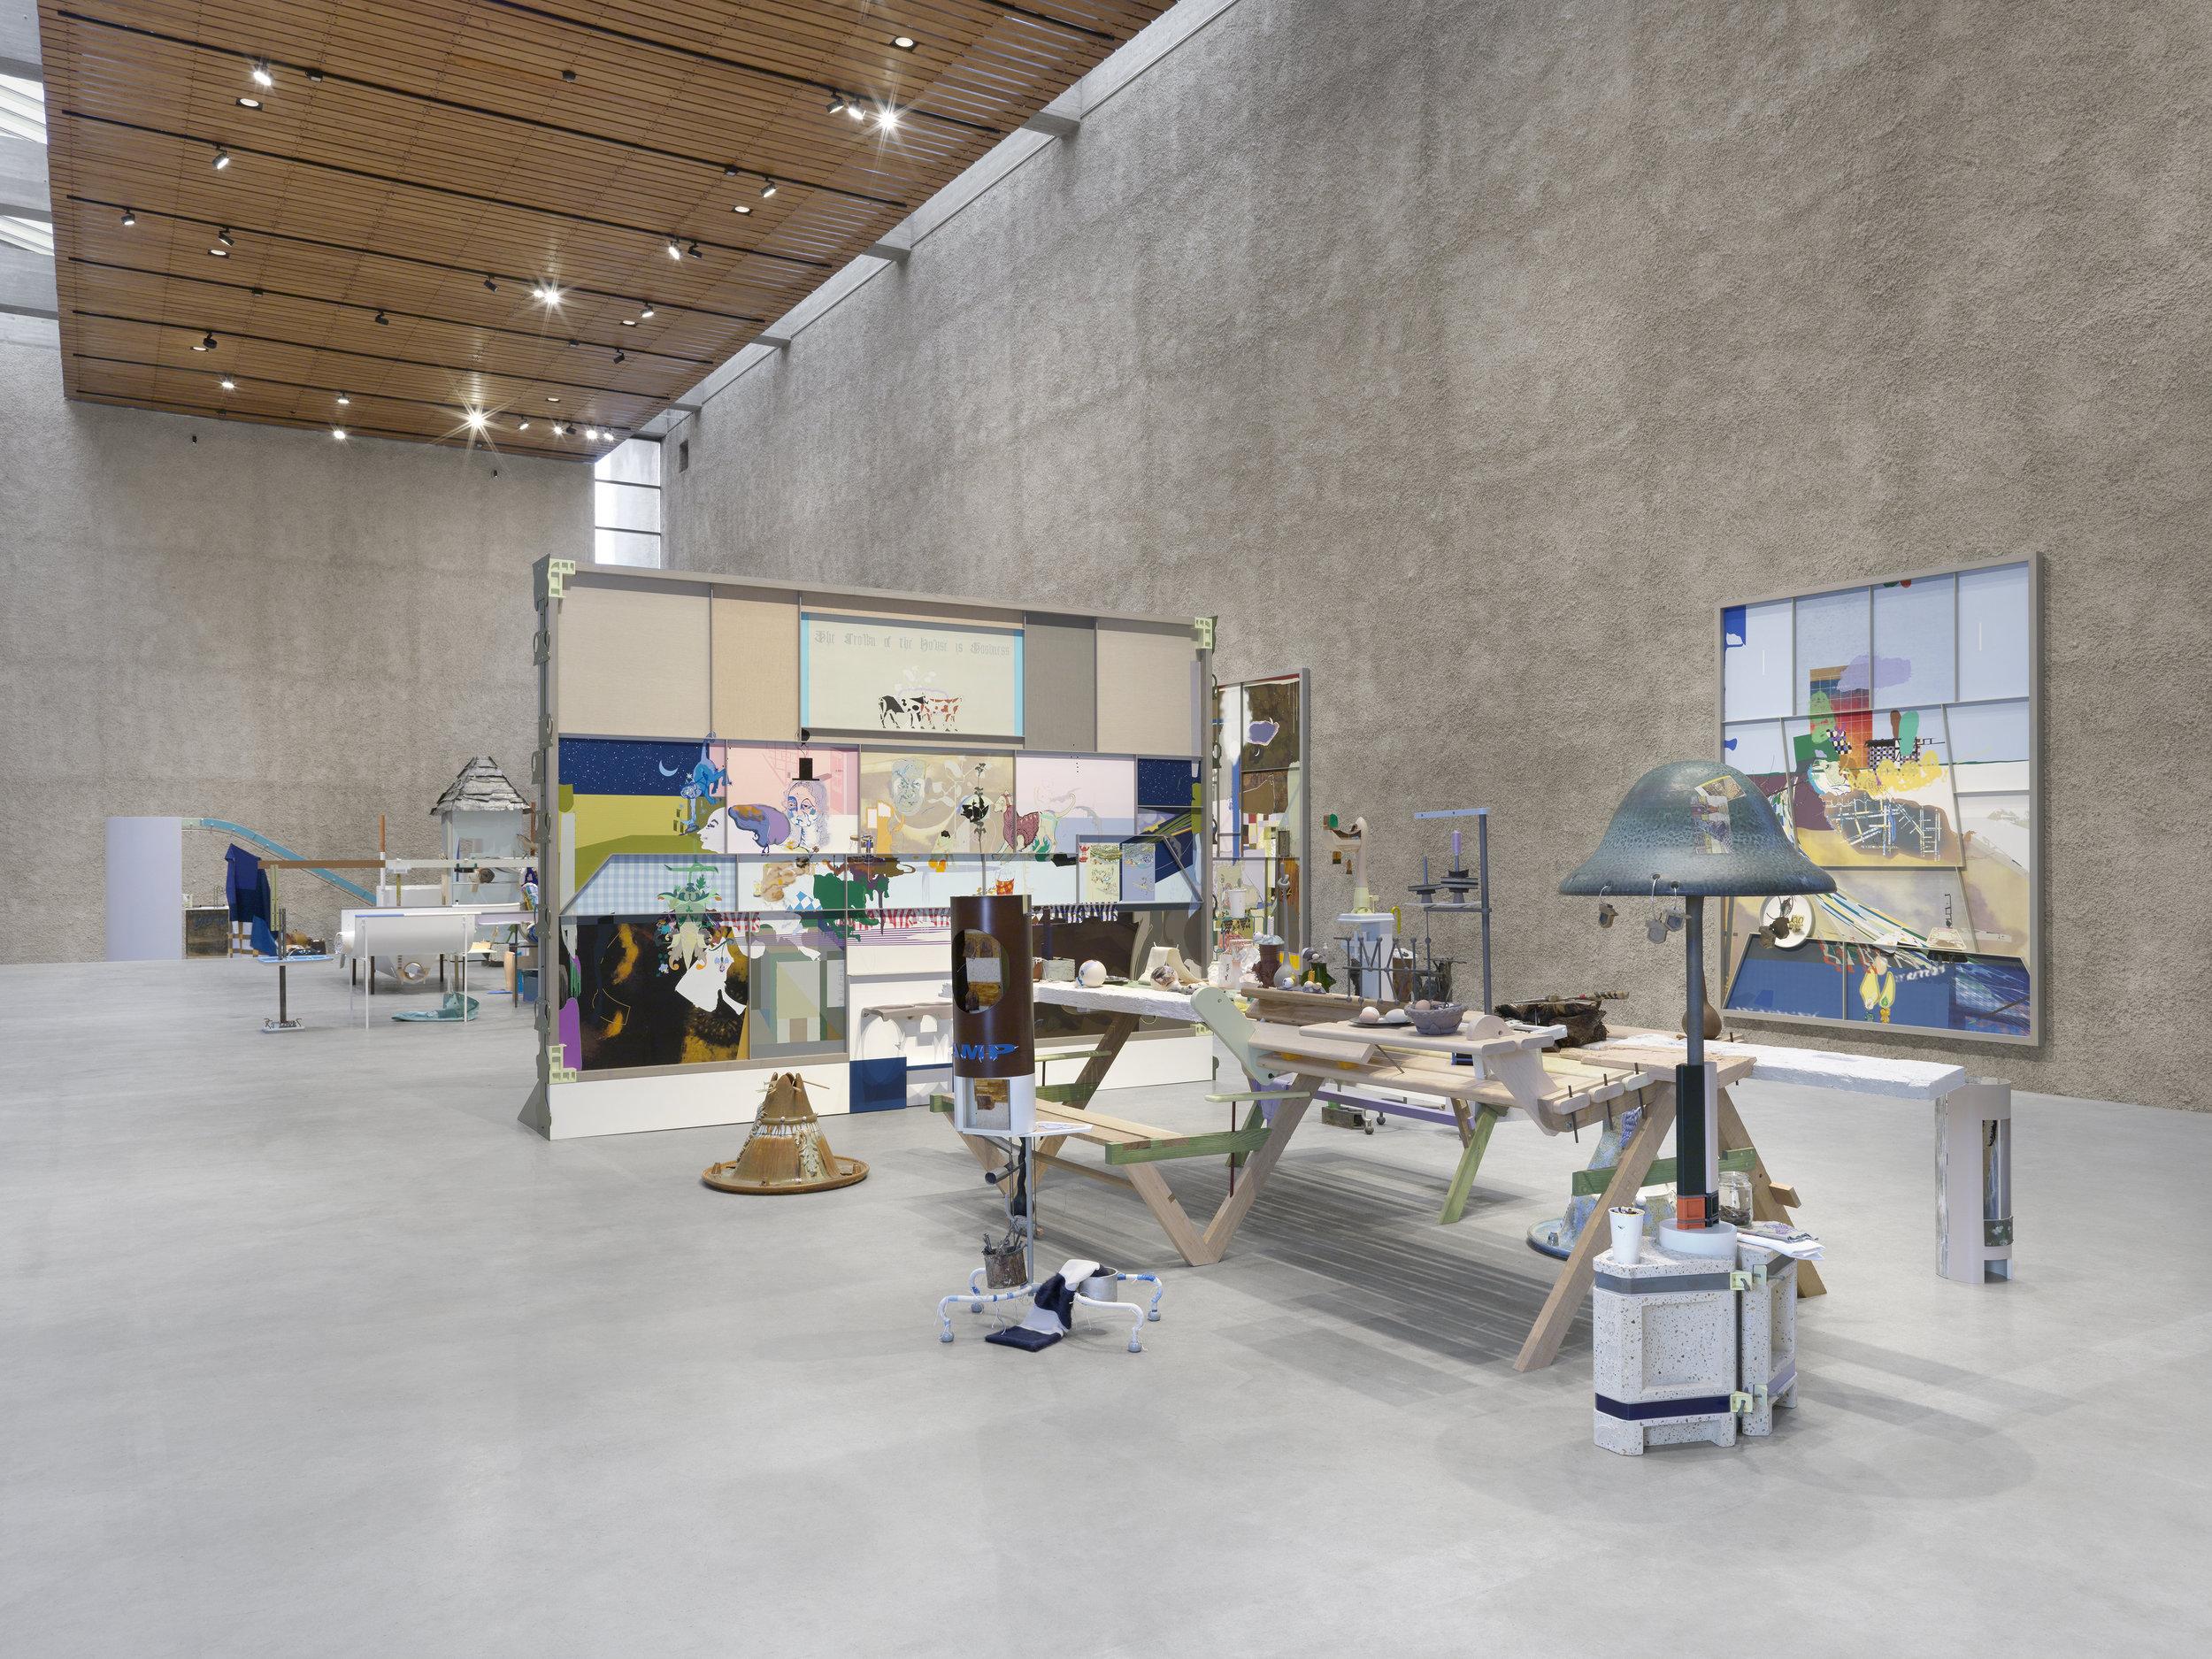 König Galerie, Berlin   Helen Marten   2019